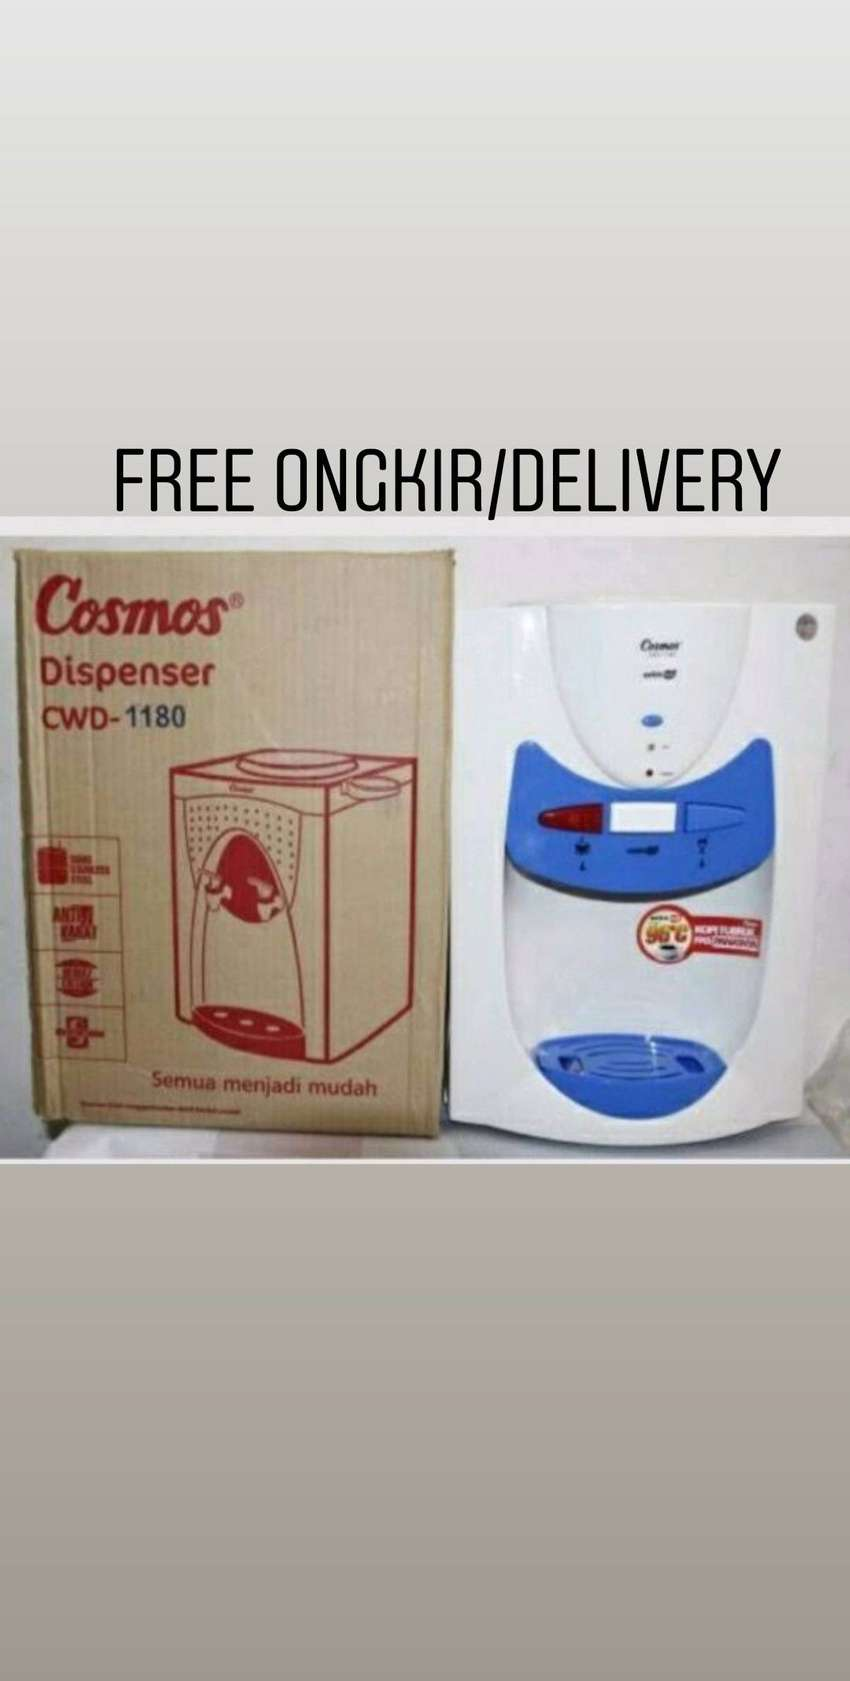 Free antar-Dispenser air meja Cosmos CWD-1180 Hot & Fresh Daya 385watt 0